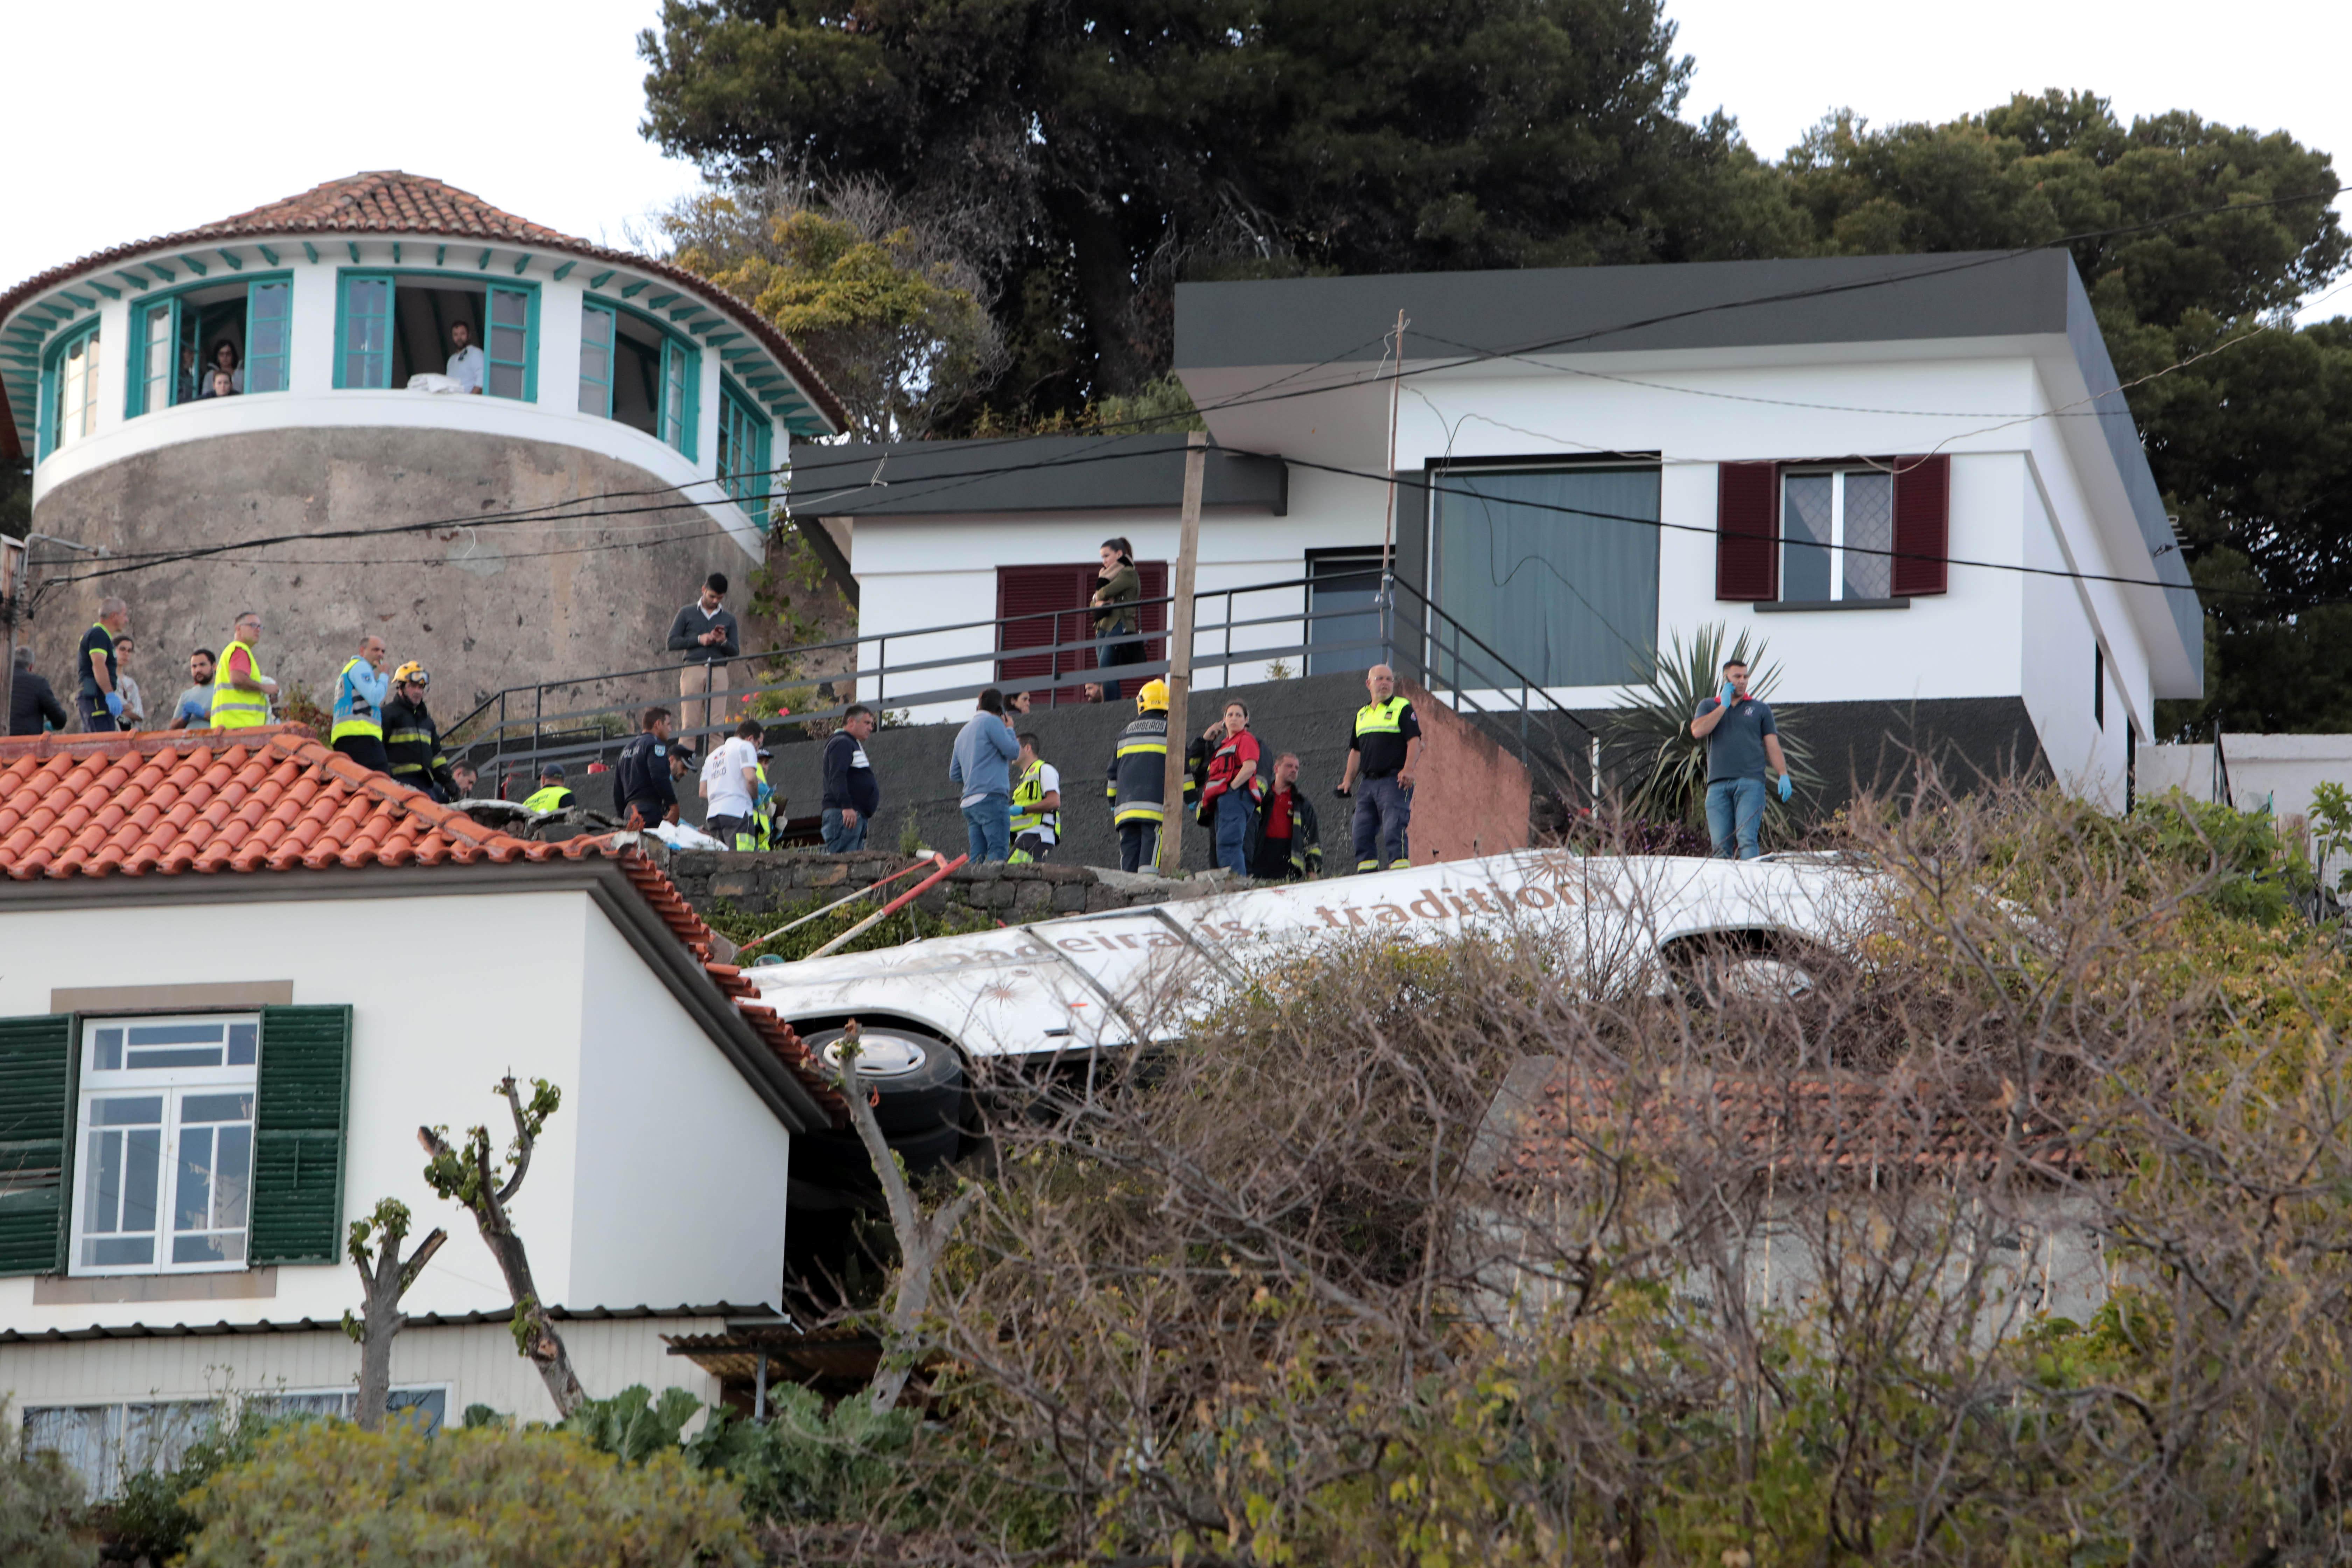 Embaixada alemã em Portugal disponibiliza contacto de emergência